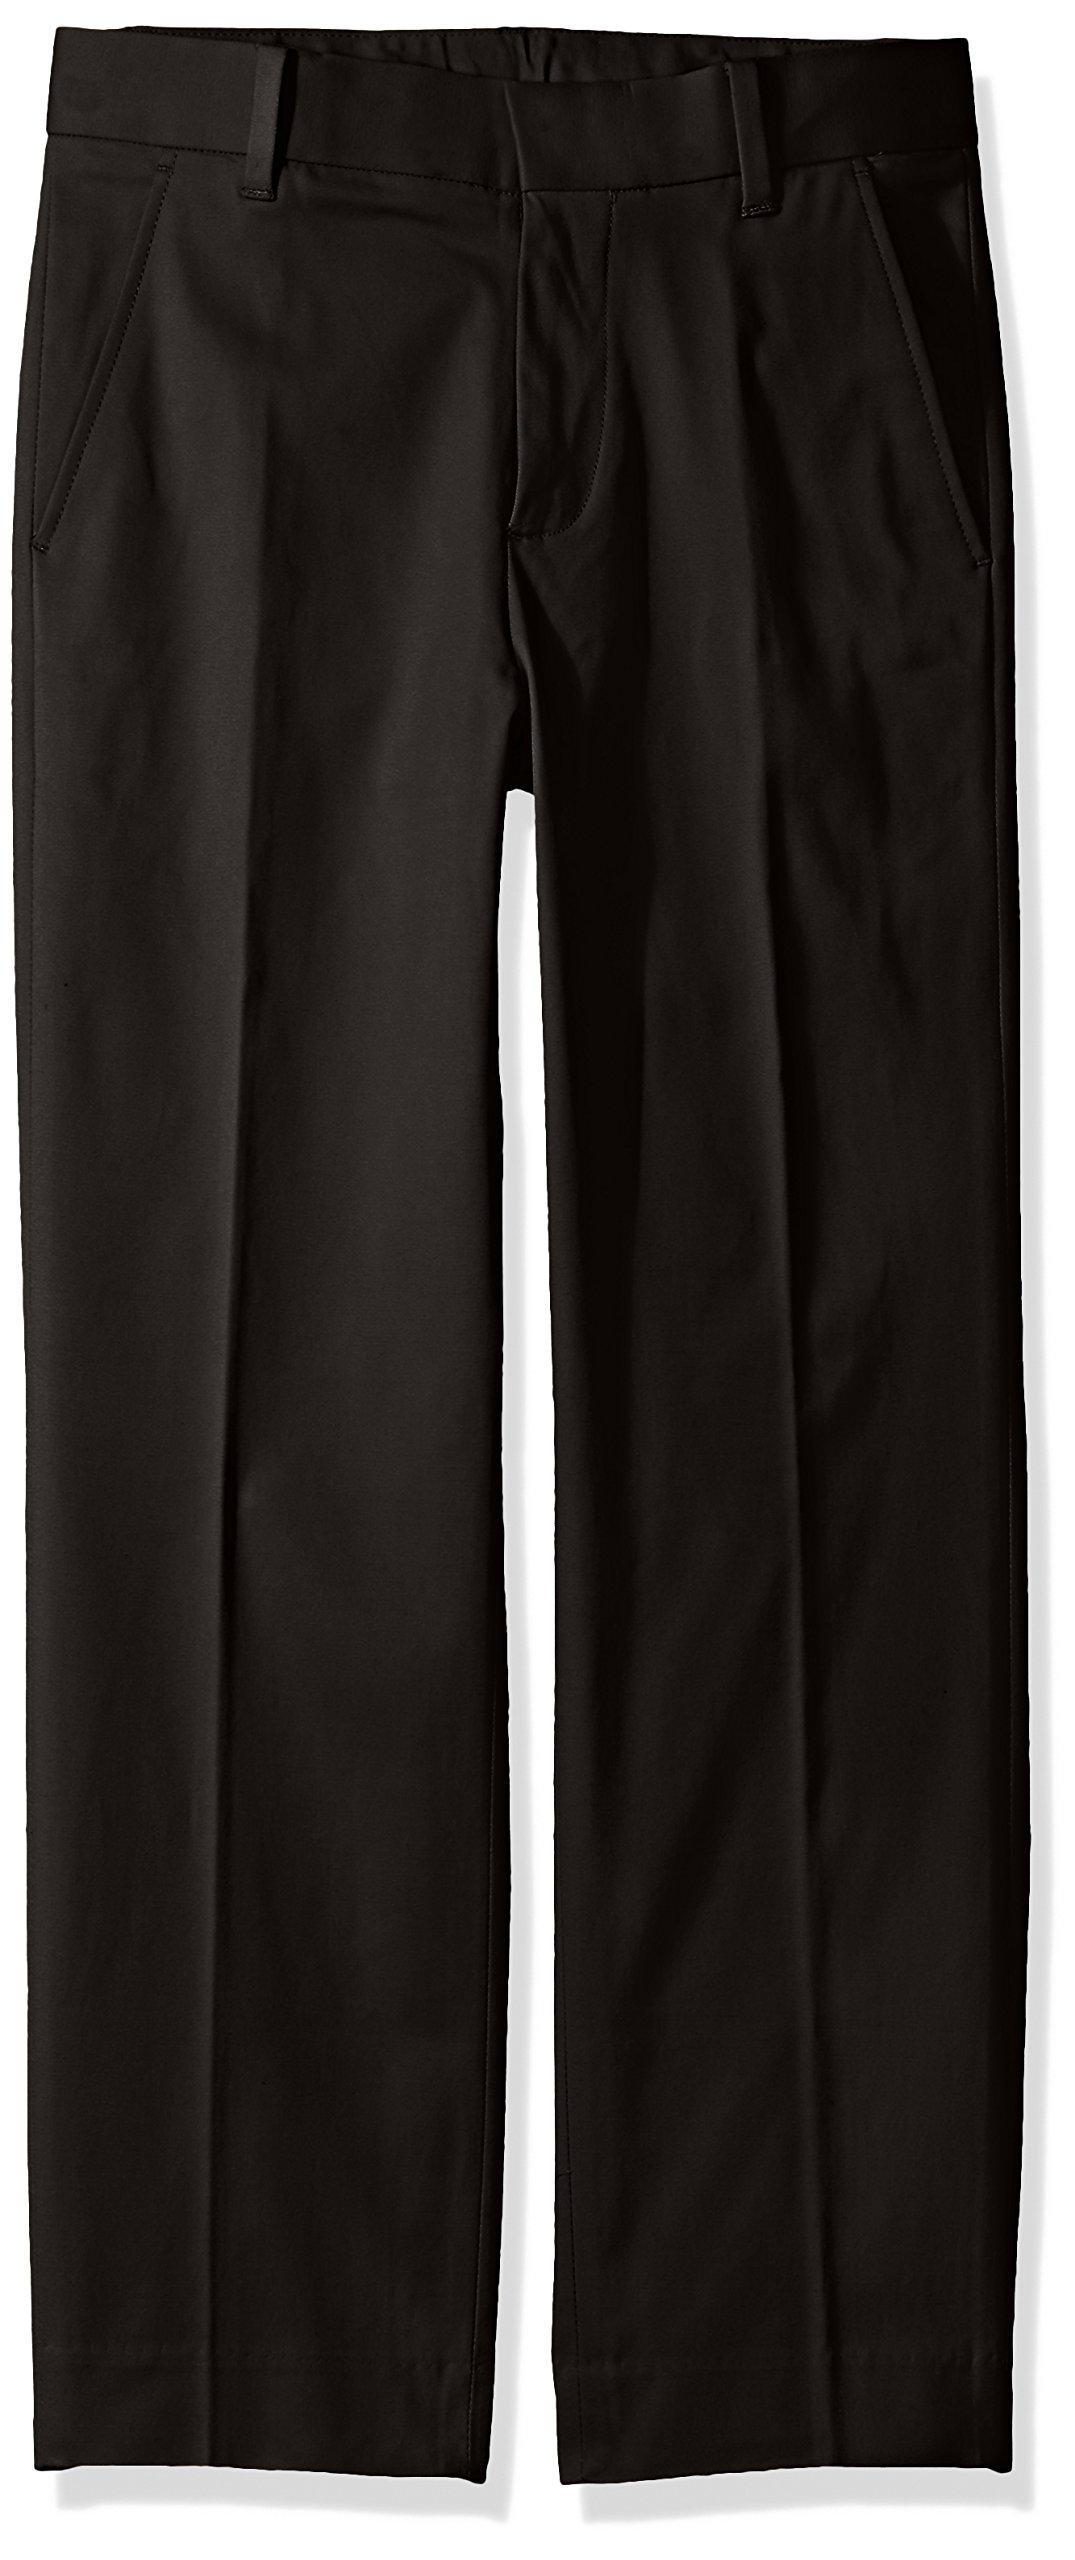 Calvin Klein Big Boys' Fine Line Stretch Twill Pant, Black, 8